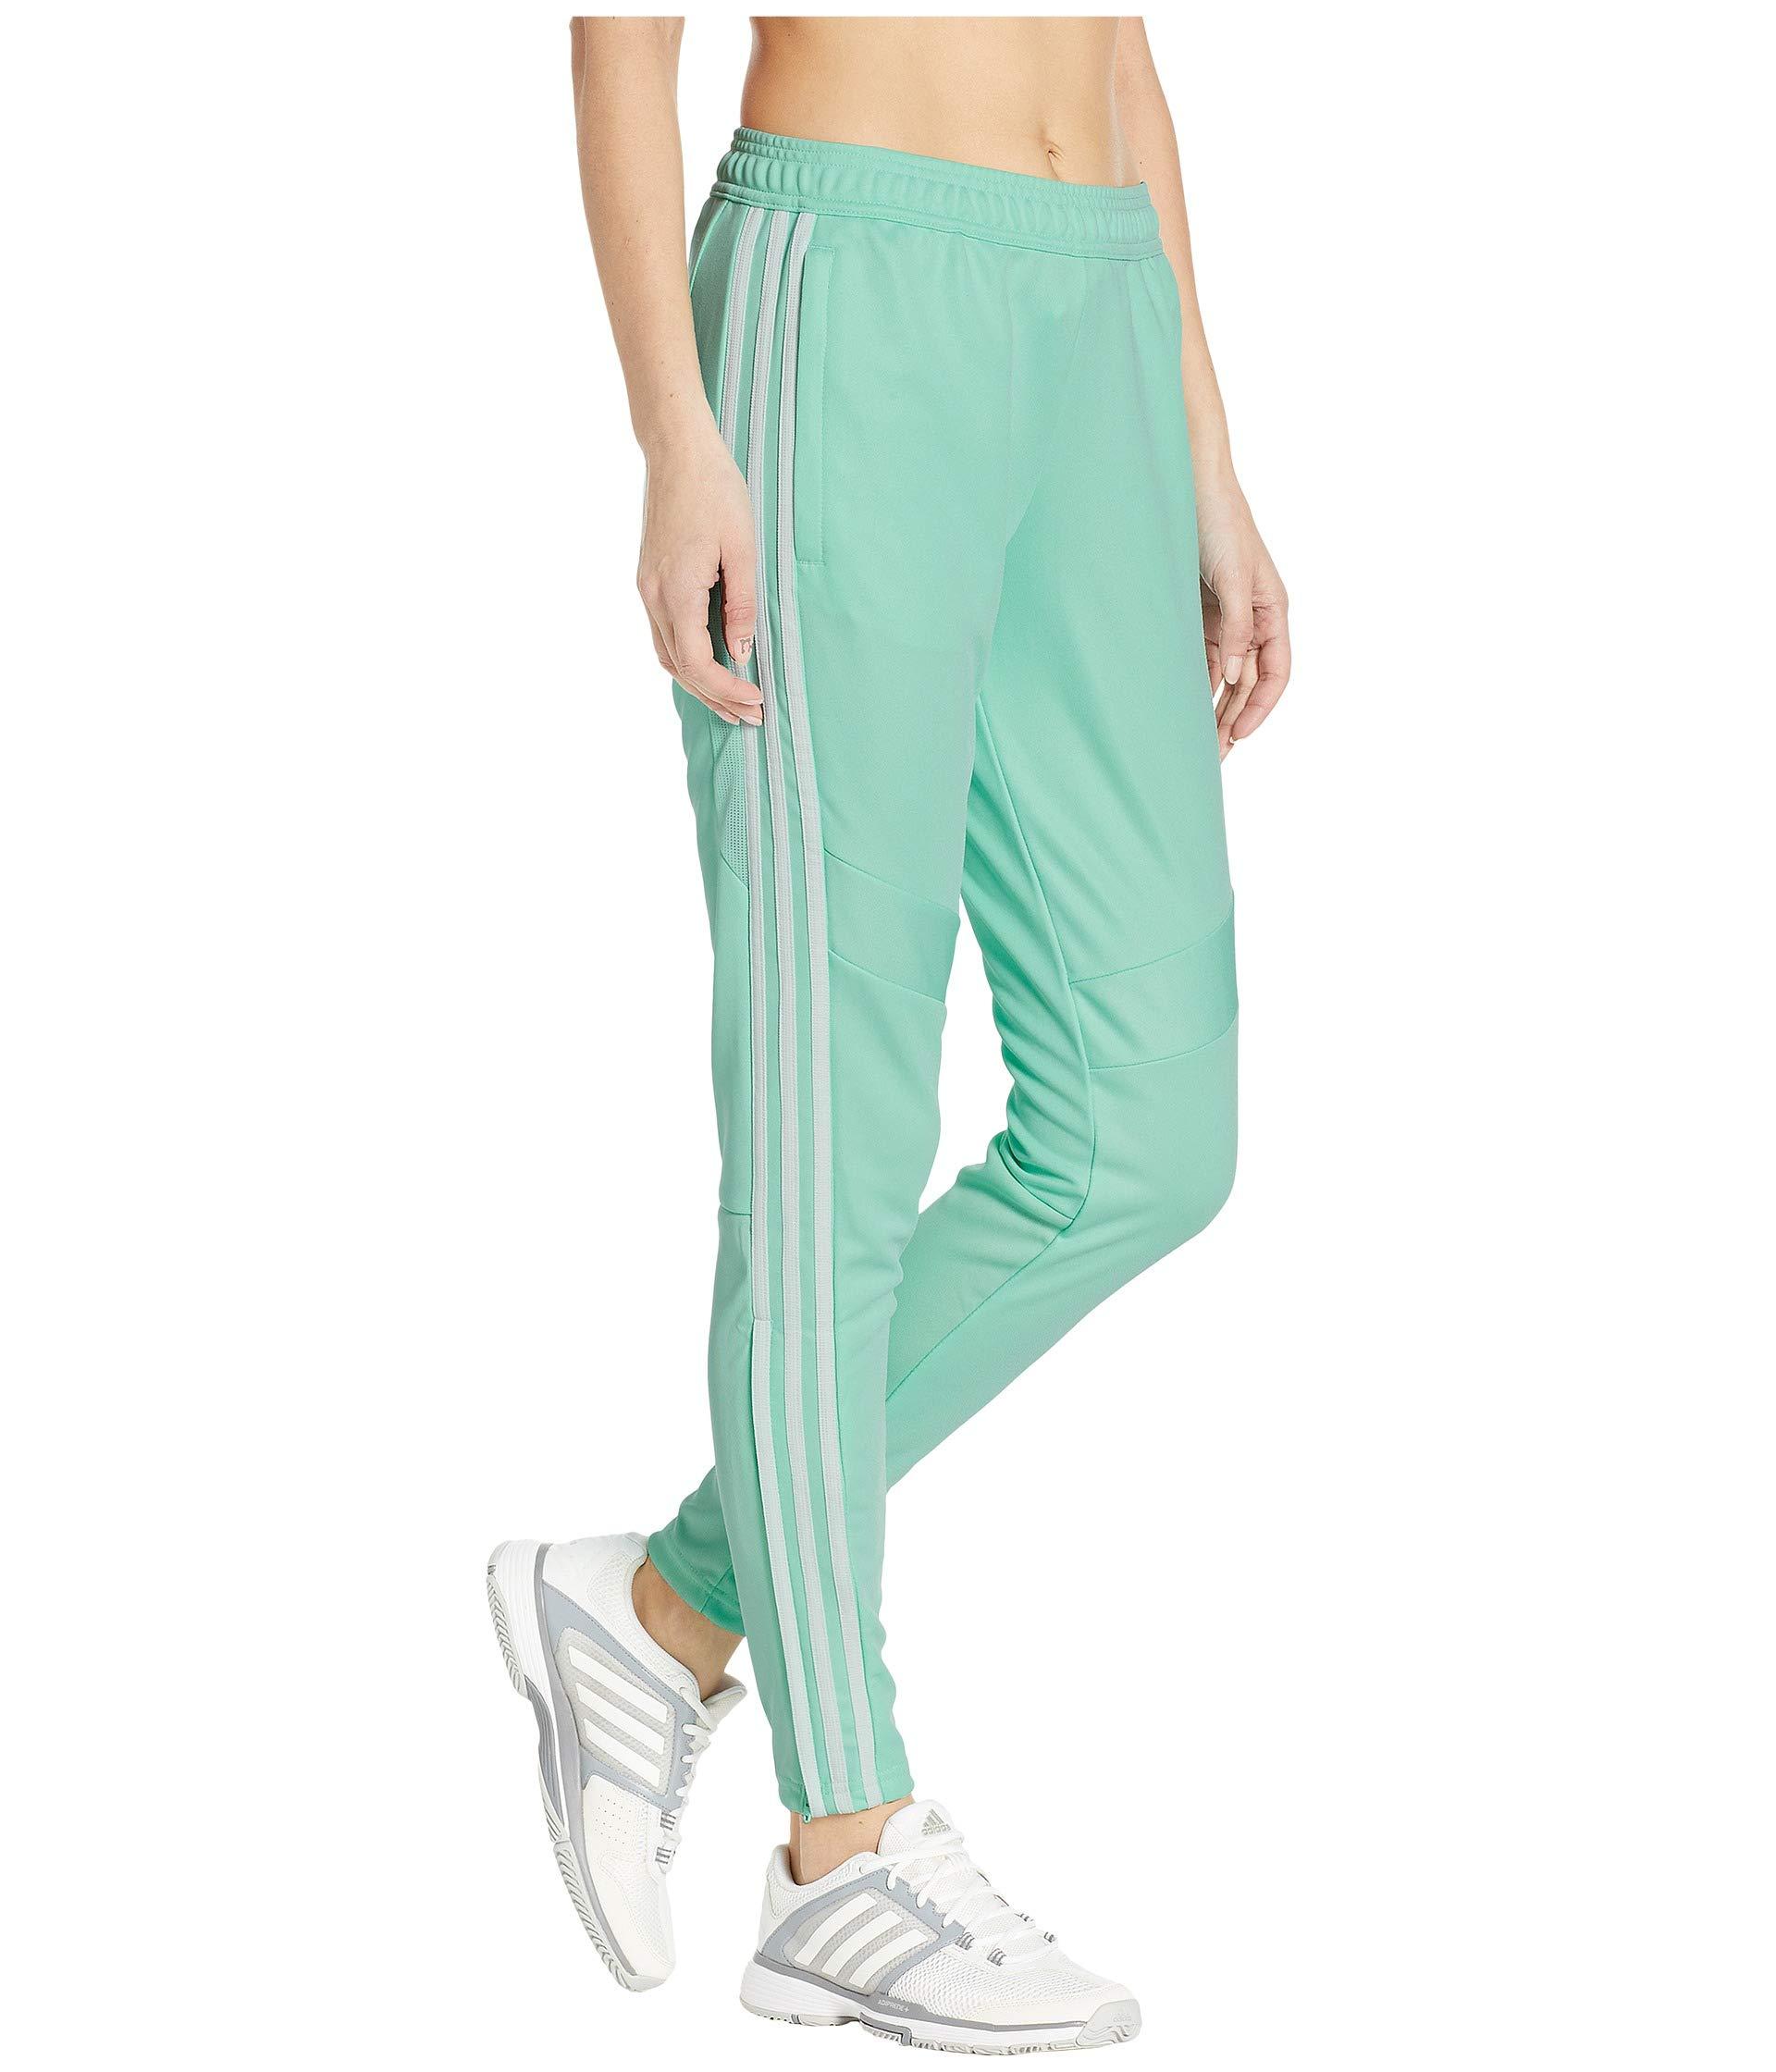 adidas Women's Tiro '19 Pants Clear Mint/White Small 30 by adidas (Image #5)